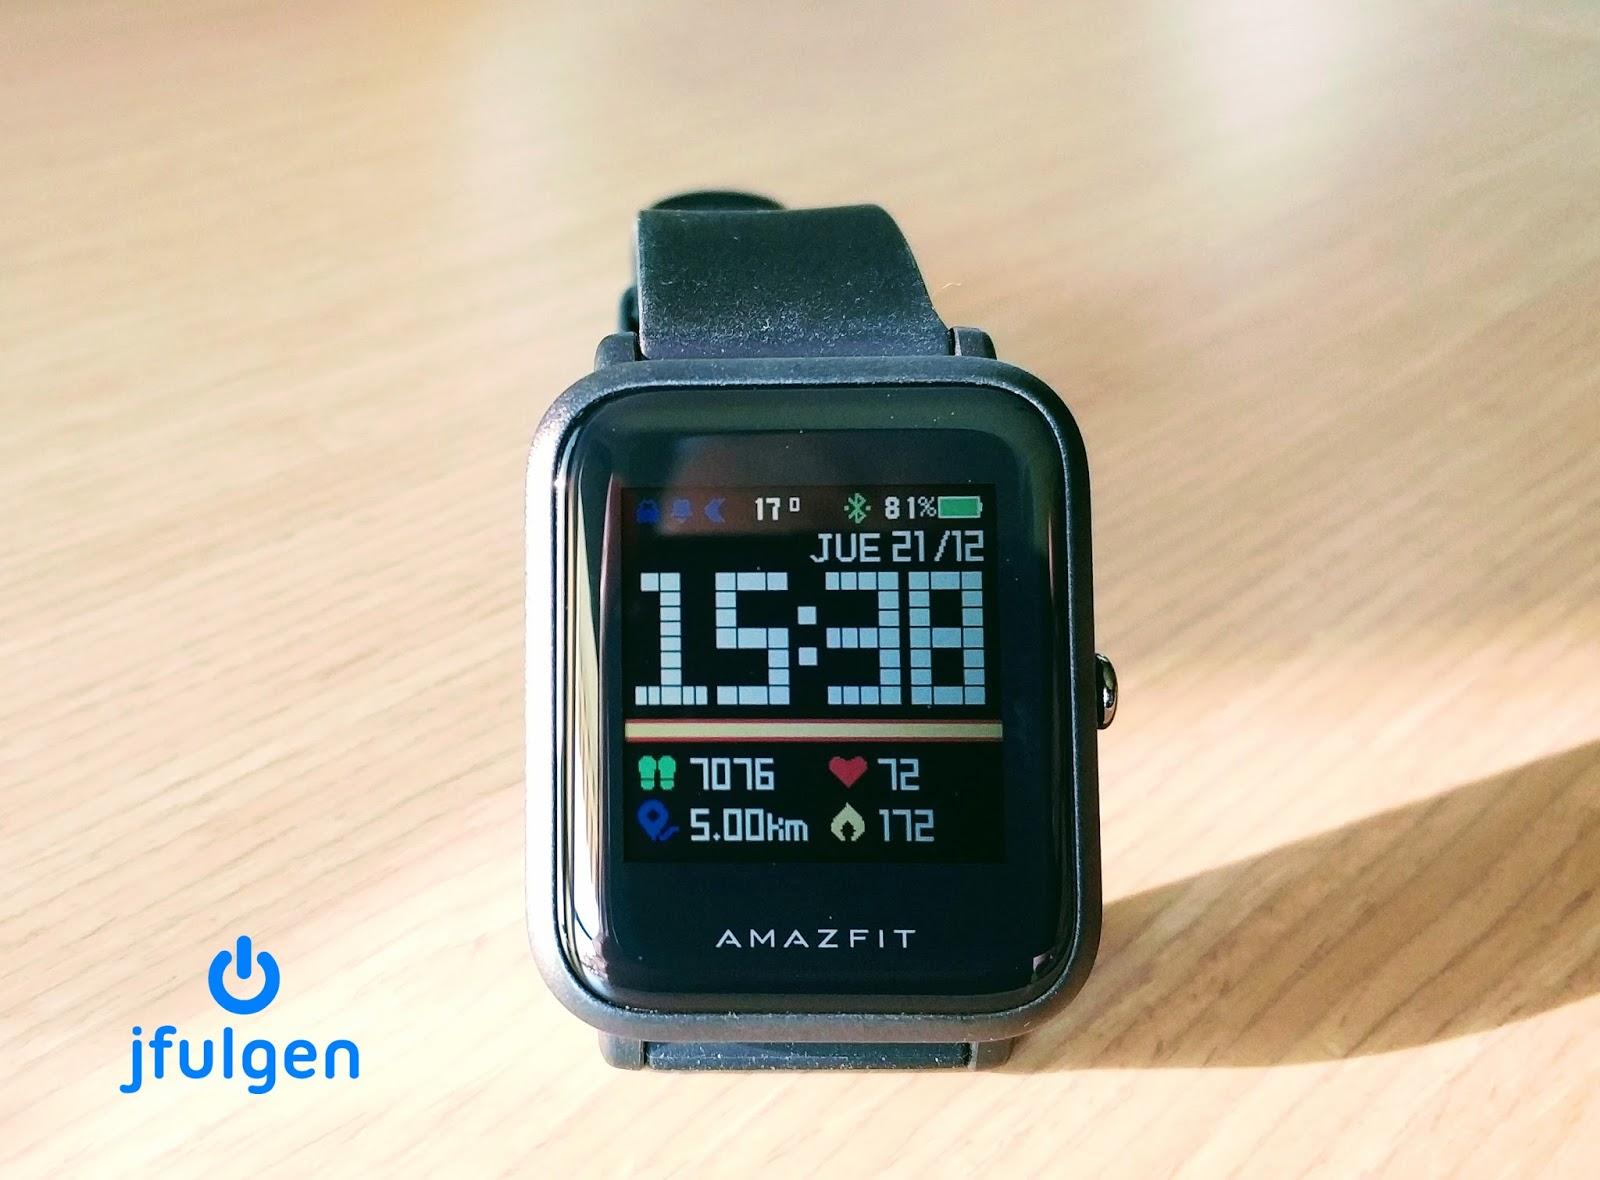 jfulgen blog: AmazFit Bip Instalar Watchfaces Personalizados